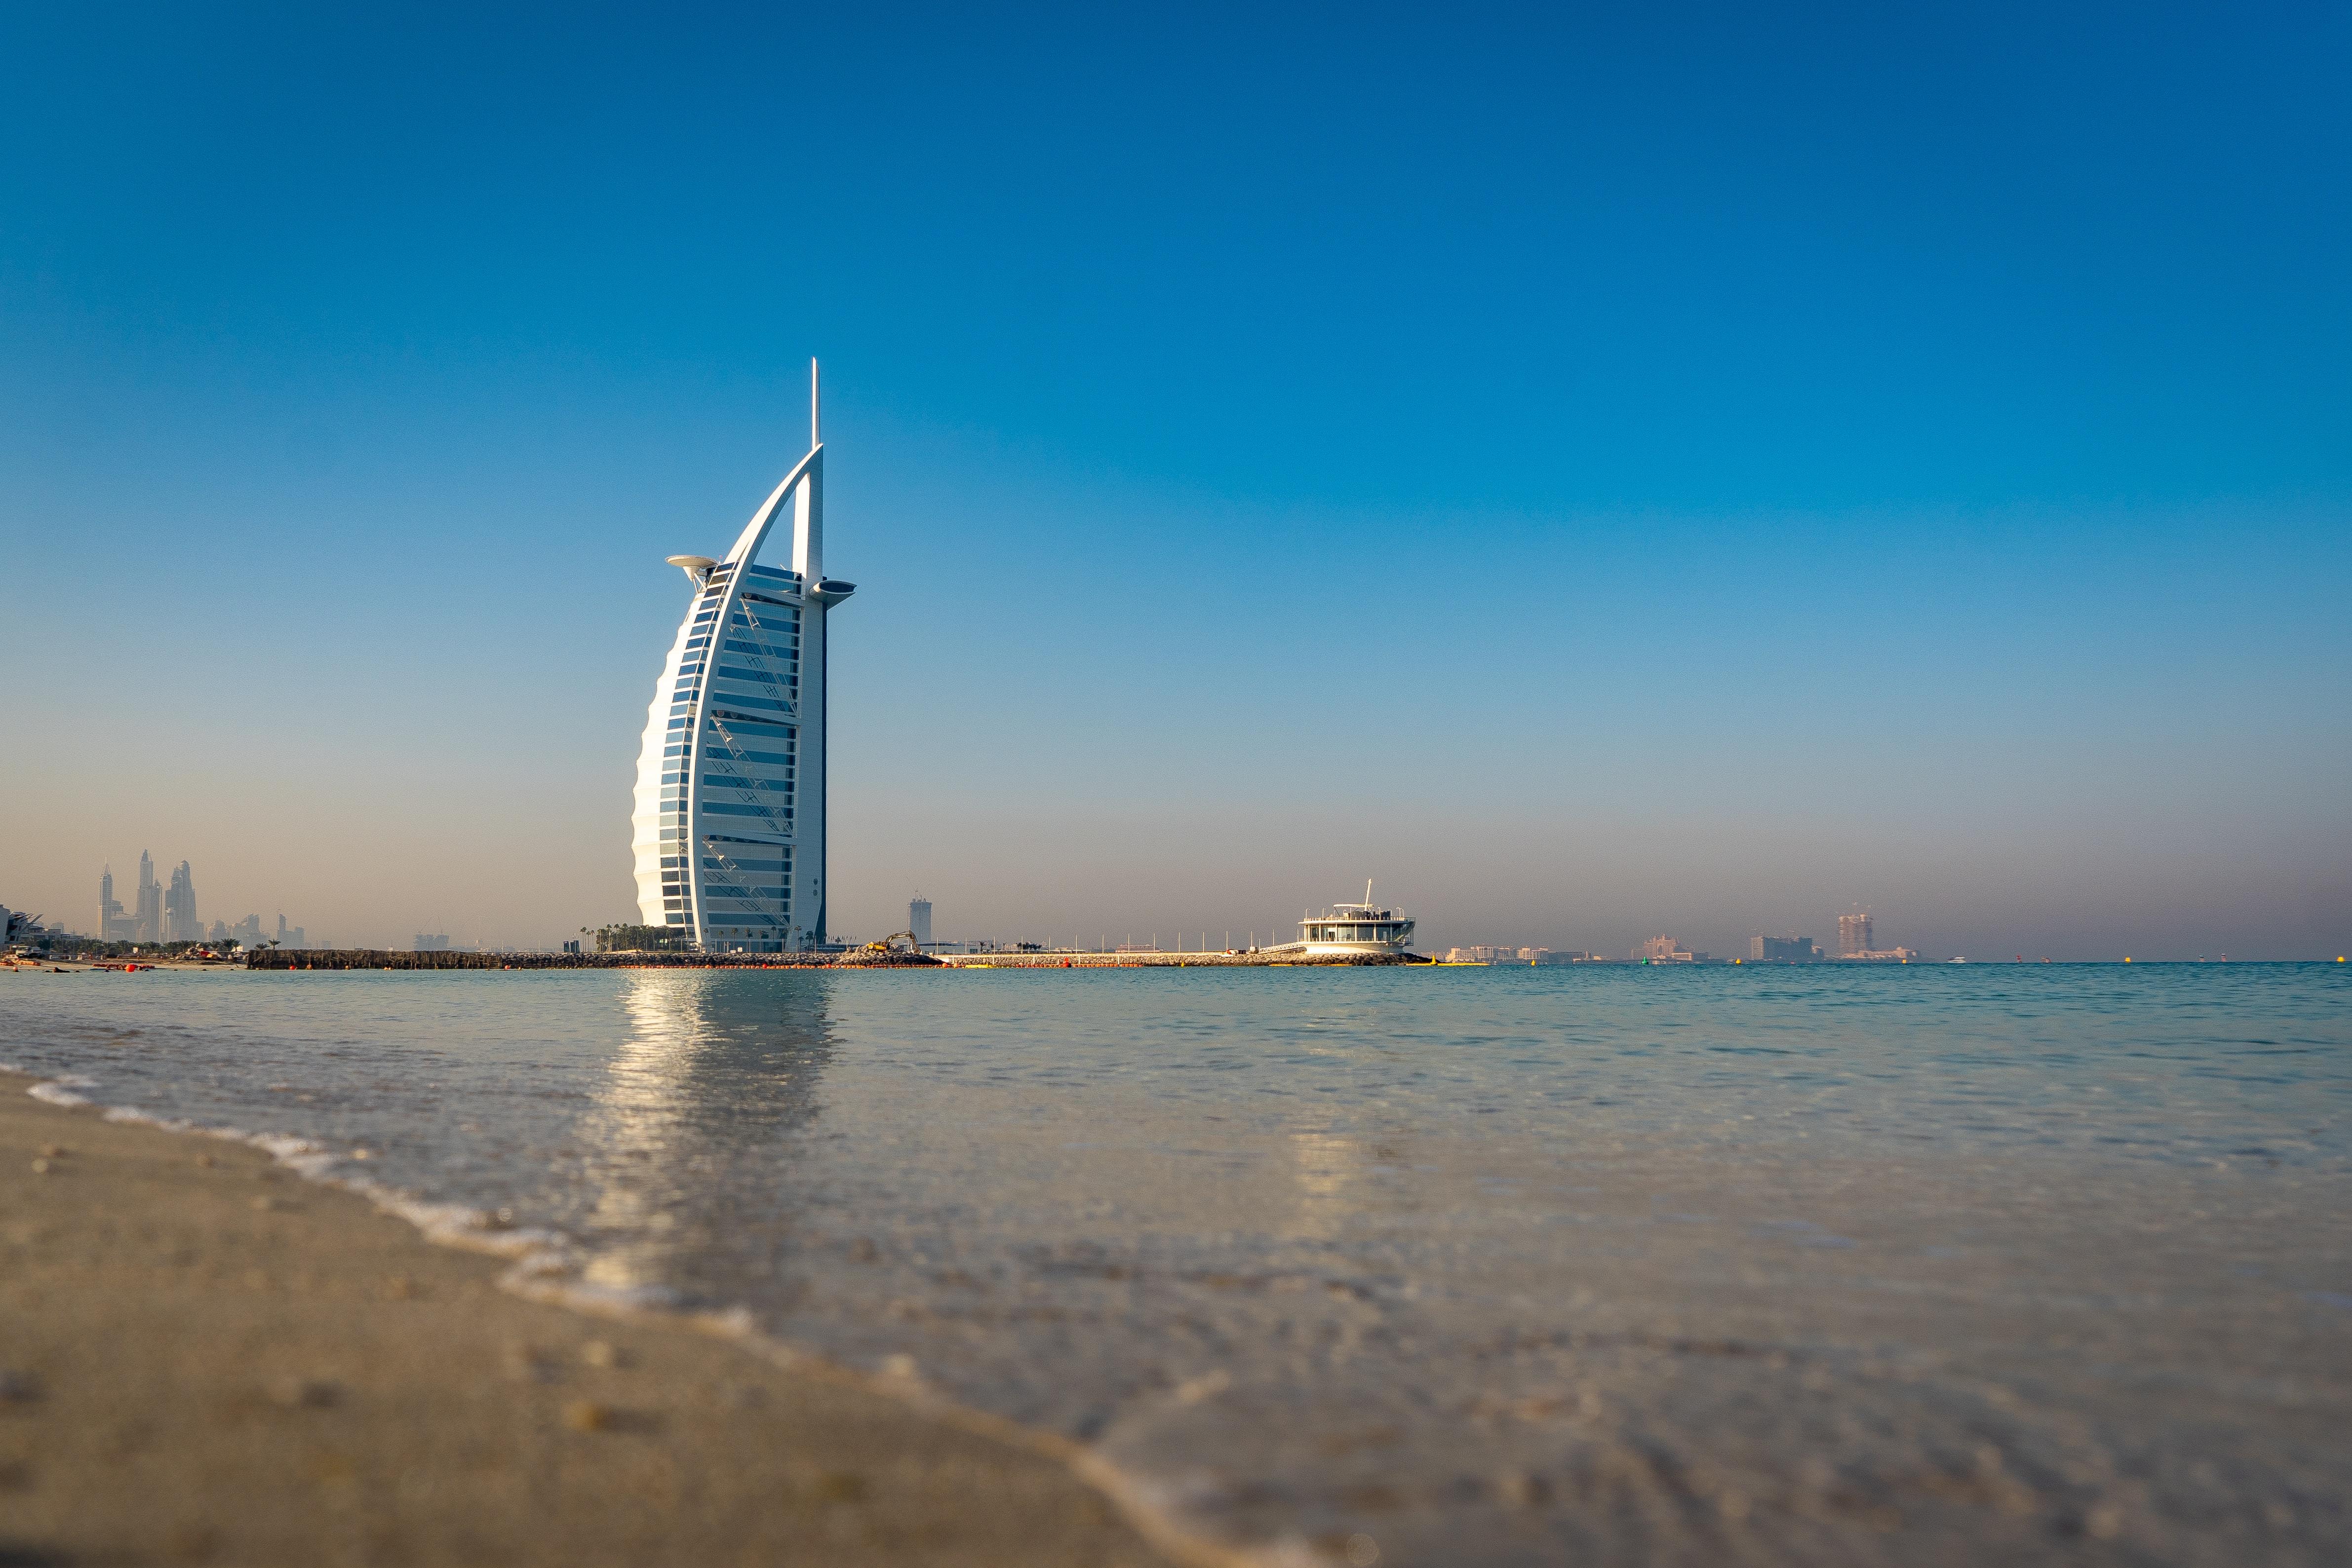 Dubai travel guide - Tops things to do in Dubai, UAE